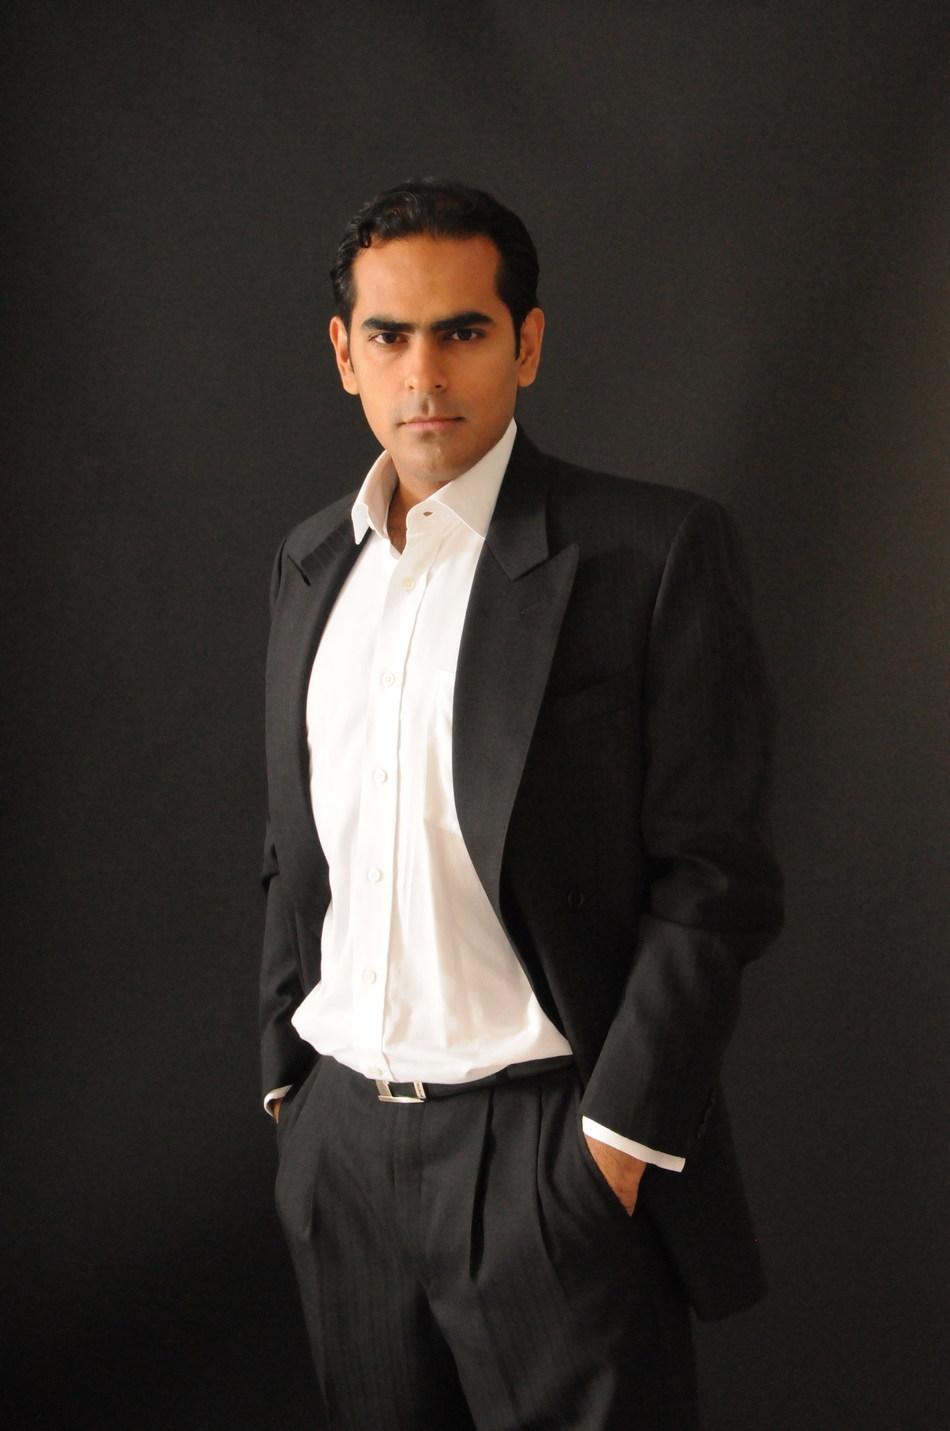 Image of Gaurav Kripalani courtesy of Sir Michael Culme-Seymour.